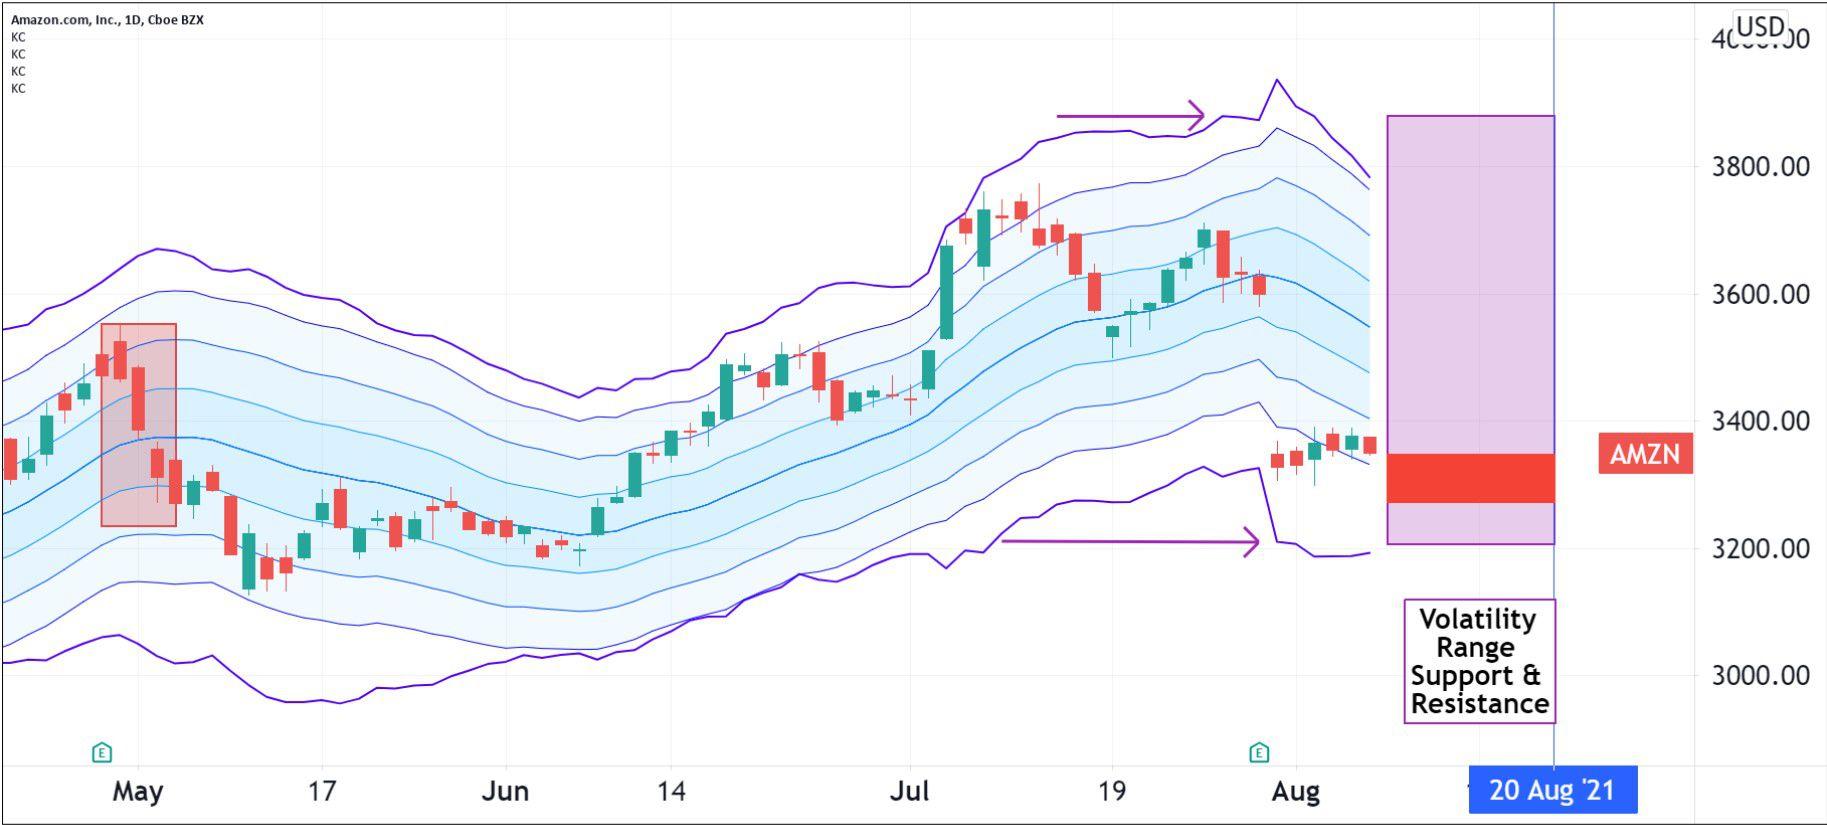 Volatility pattern for Amazon.com, Inc. (AMZN)